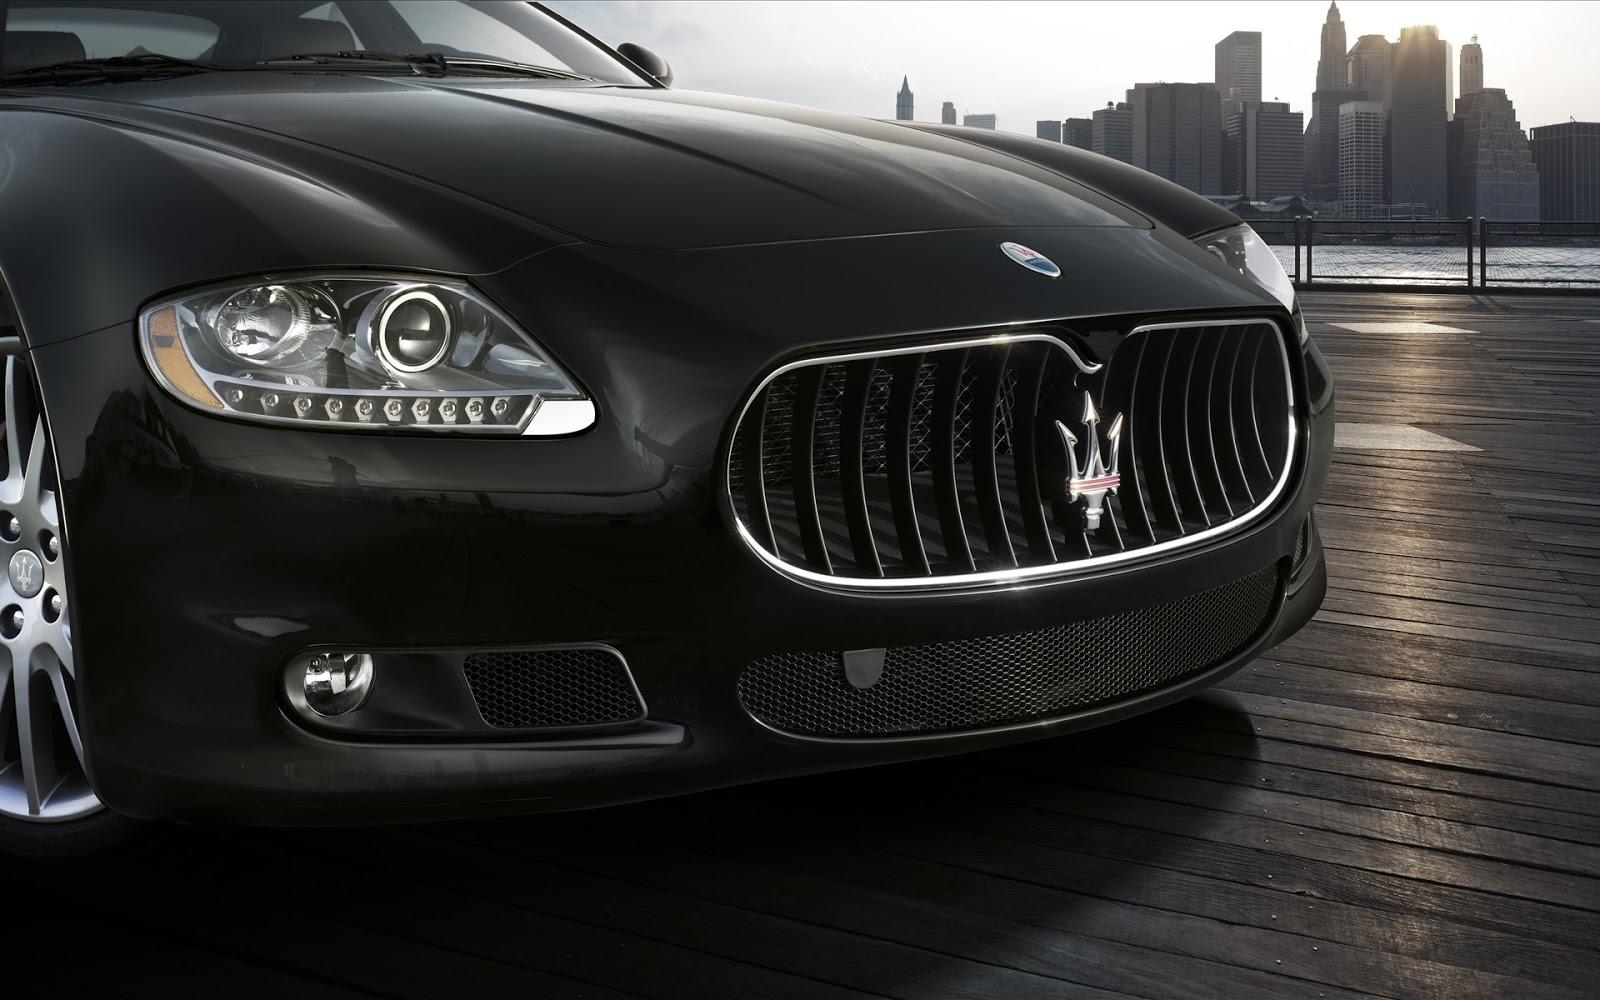 http://1.bp.blogspot.com/-RIfyDfgkAuQ/UQQfo_tPtxI/AAAAAAAAAtM/i_YvIjKC7_4/s1600/Maserati%2BGrille%2BLogo%2BWallpaper.jpg